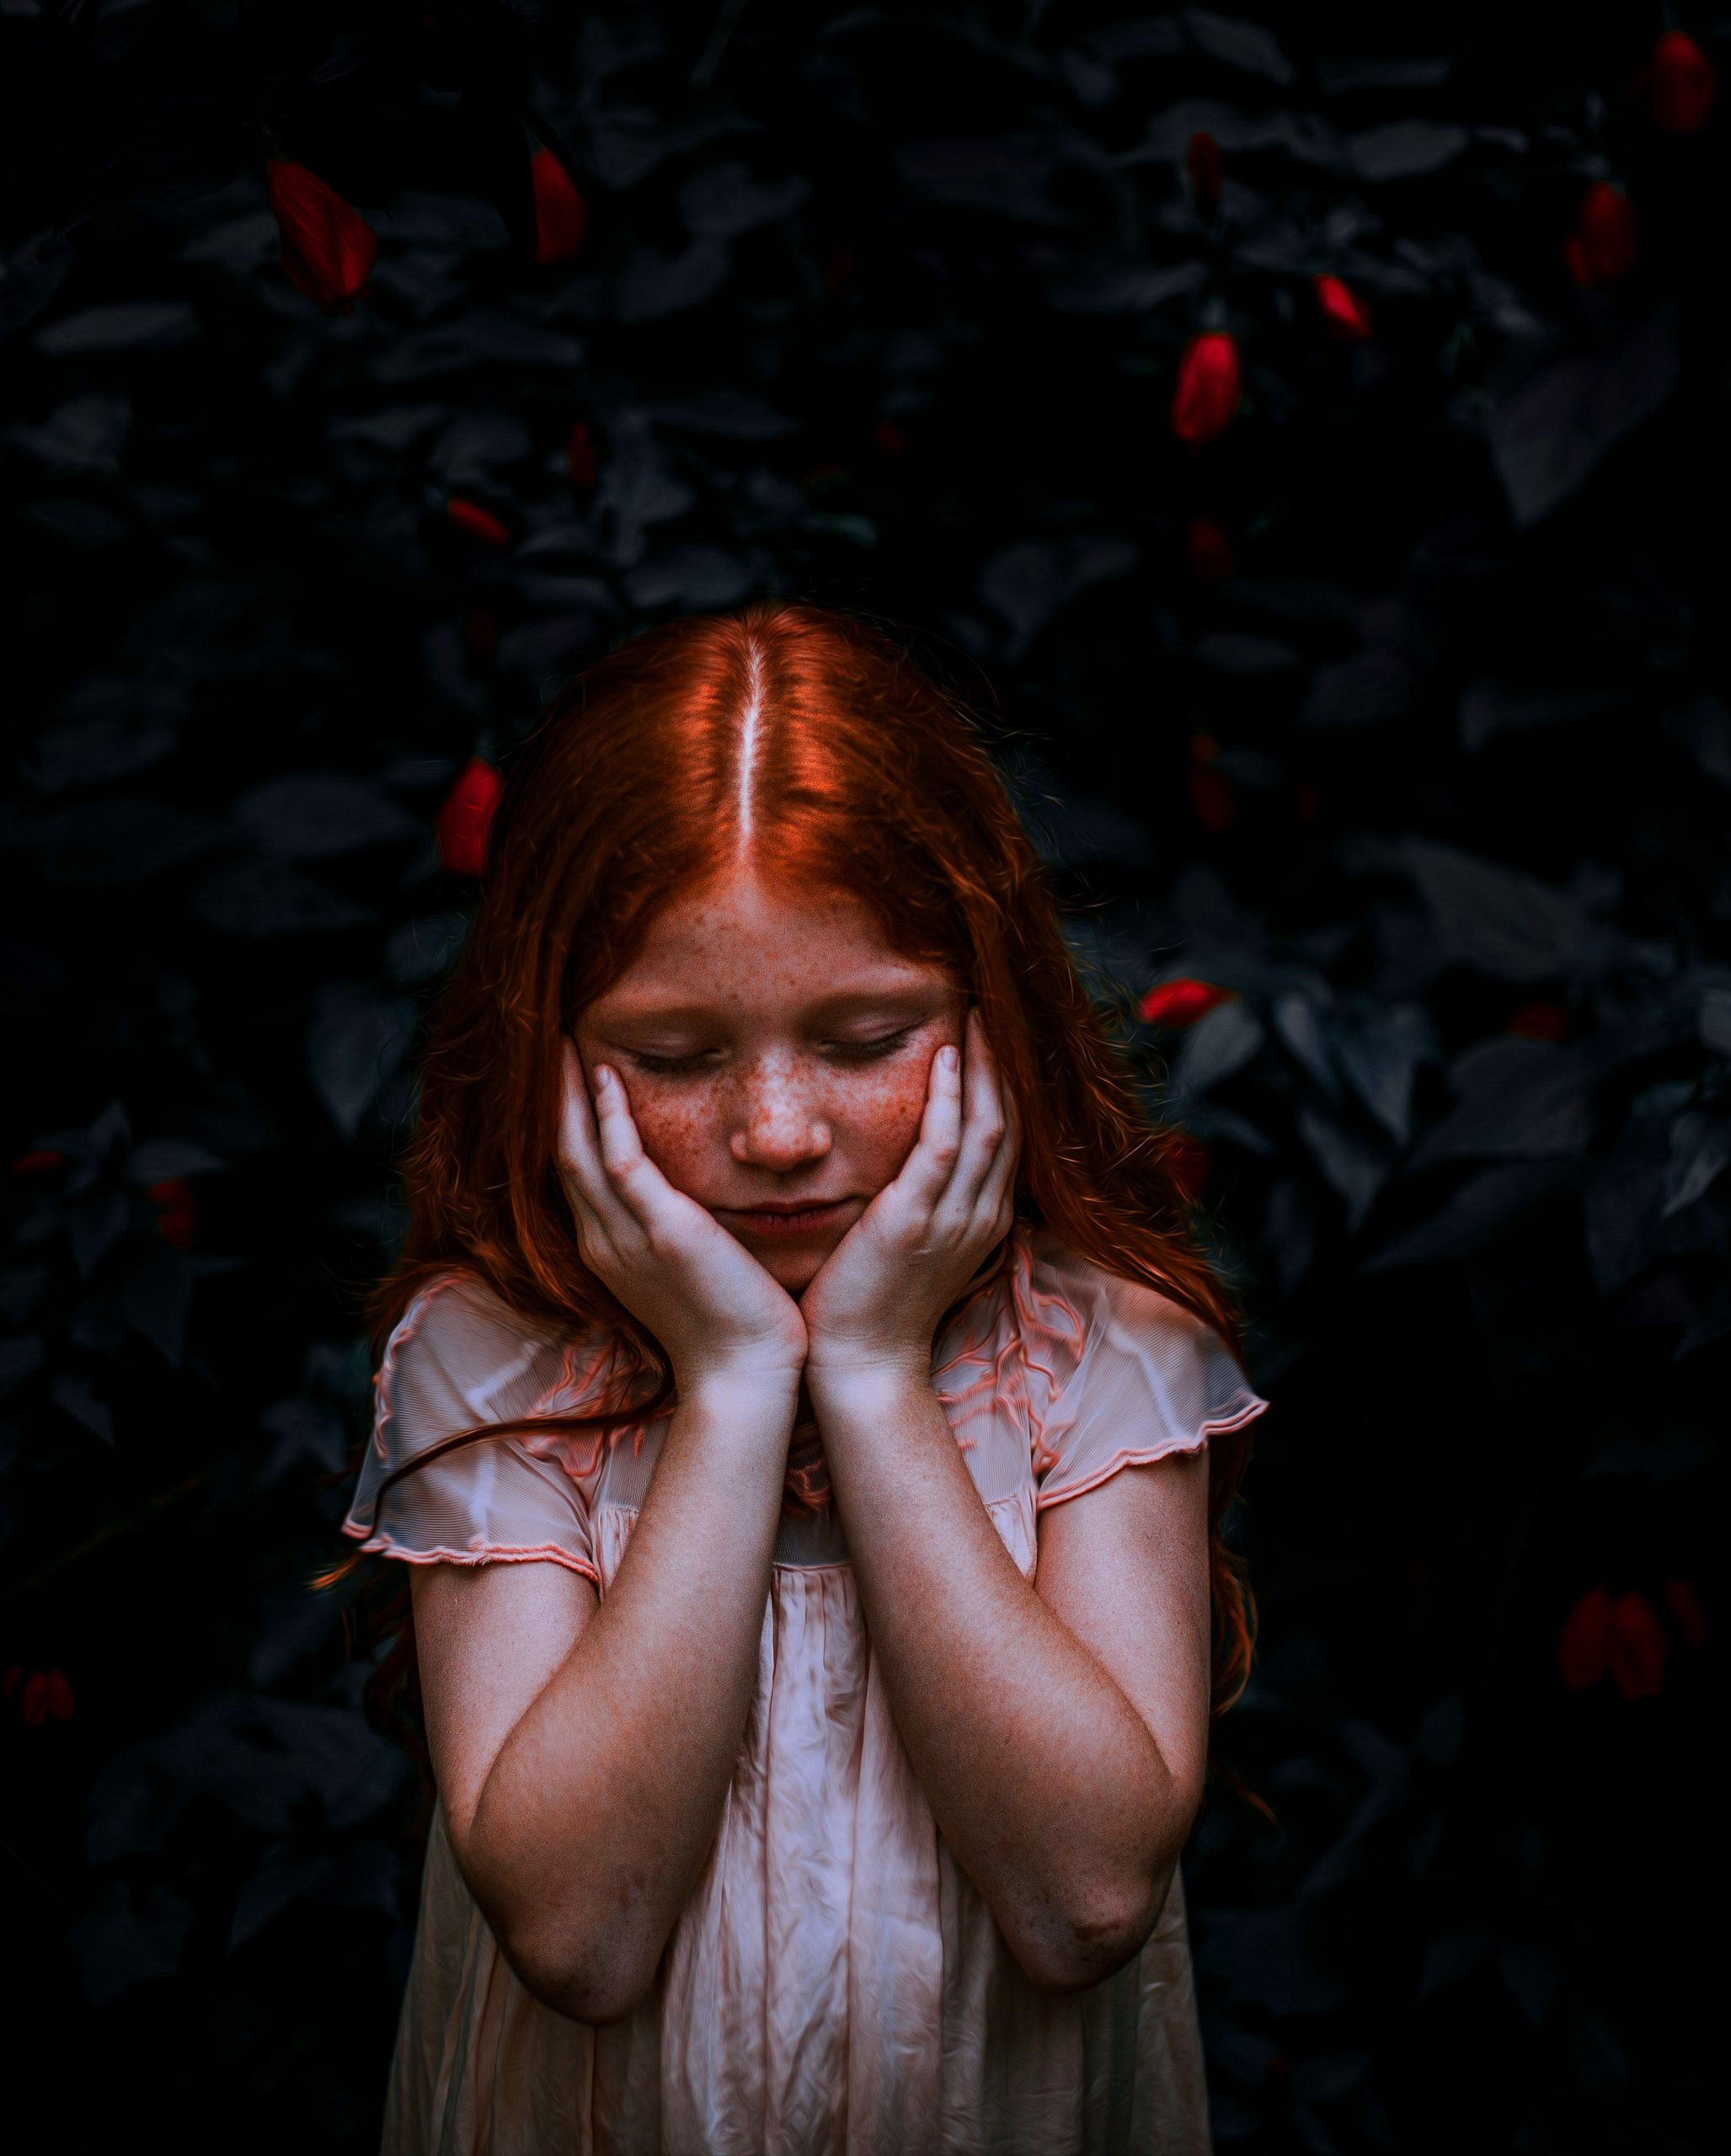 1080P Sad Girl Whatsapp Dp Images photo pics